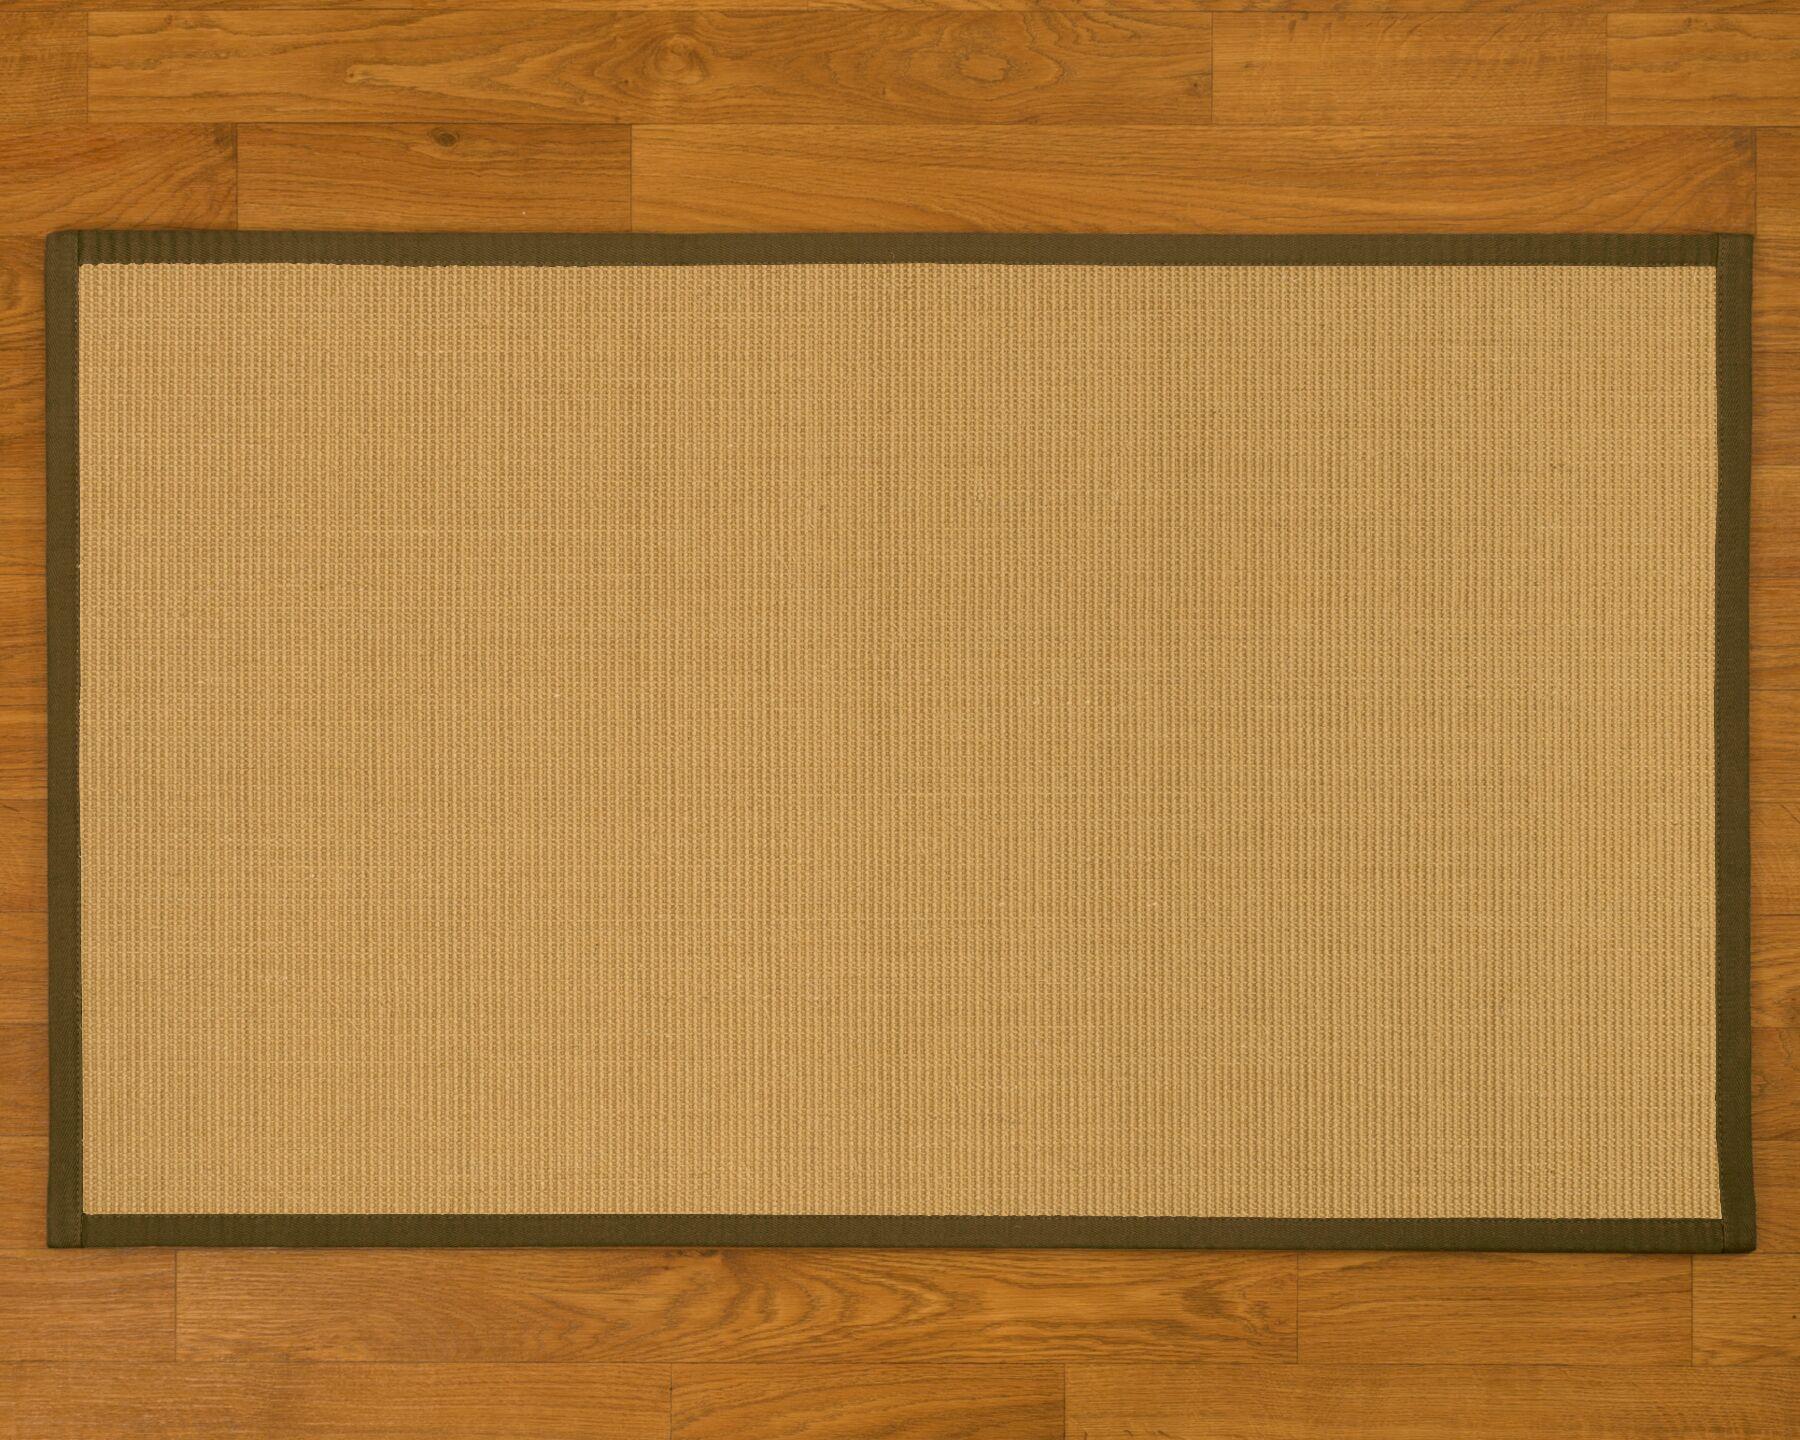 Buschwickl Handmade Beige Area Rug Rug Size: Rectangle 12' x 15'